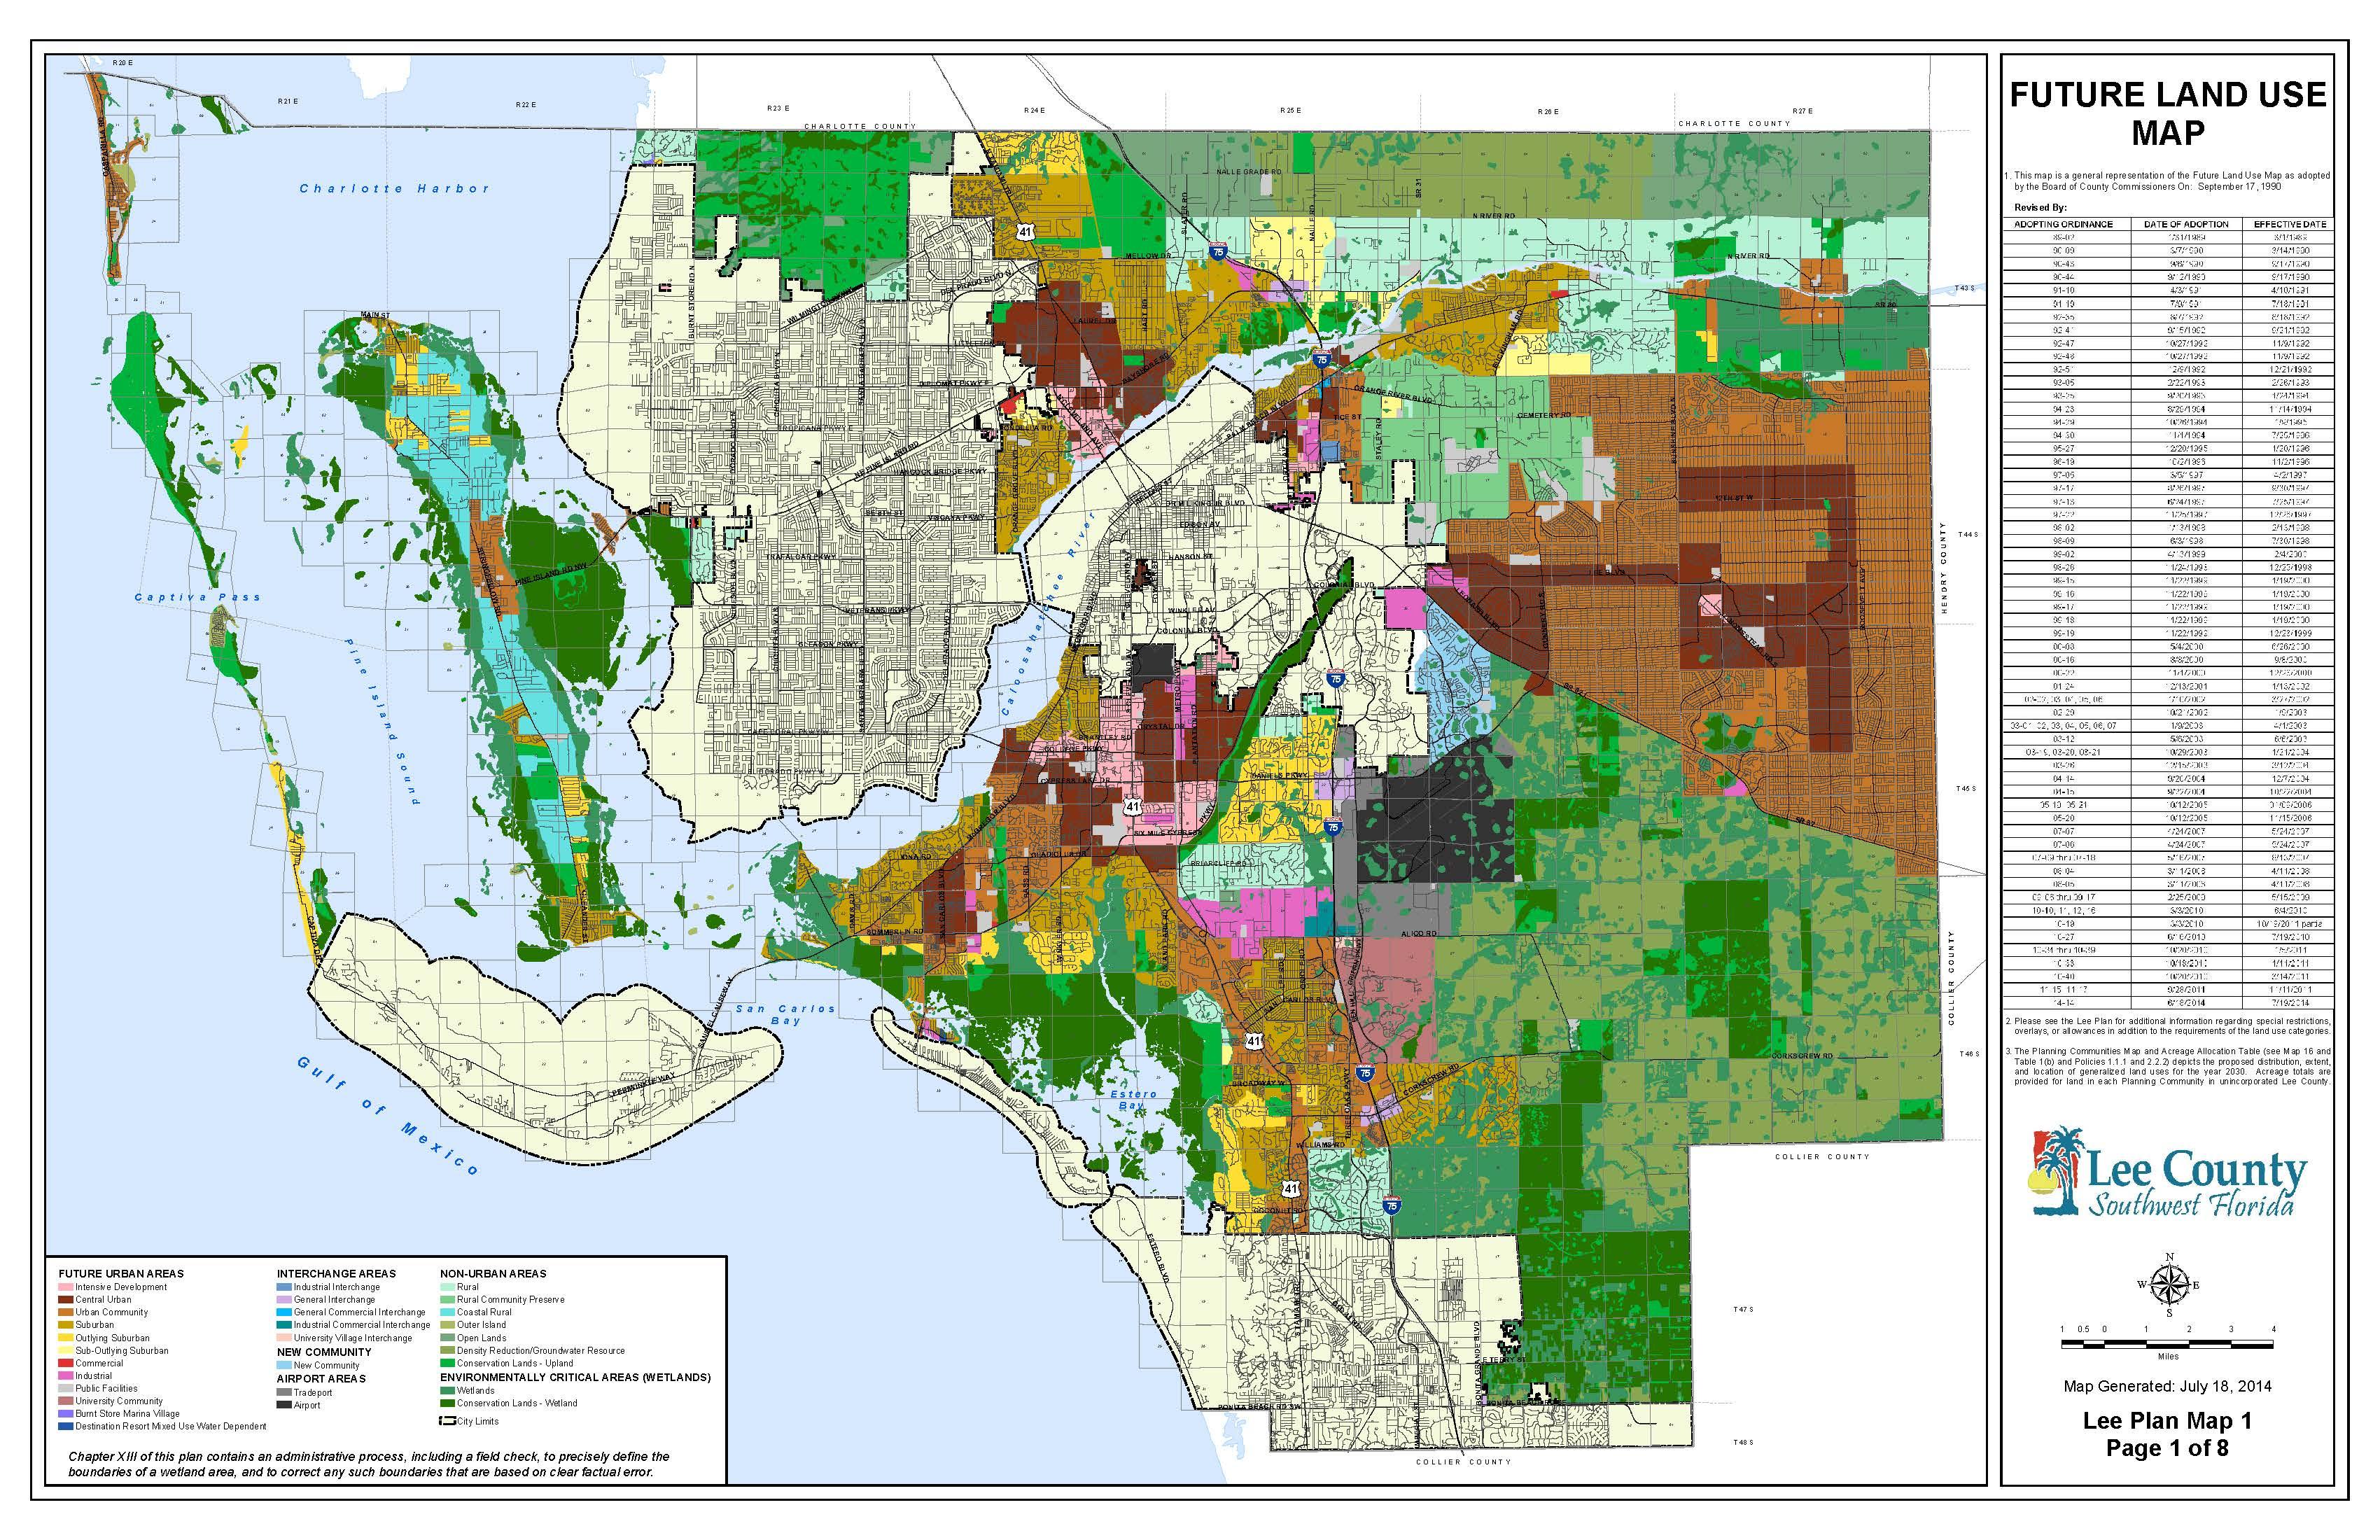 The Future Land Use Map - Florida Land Elevation Map